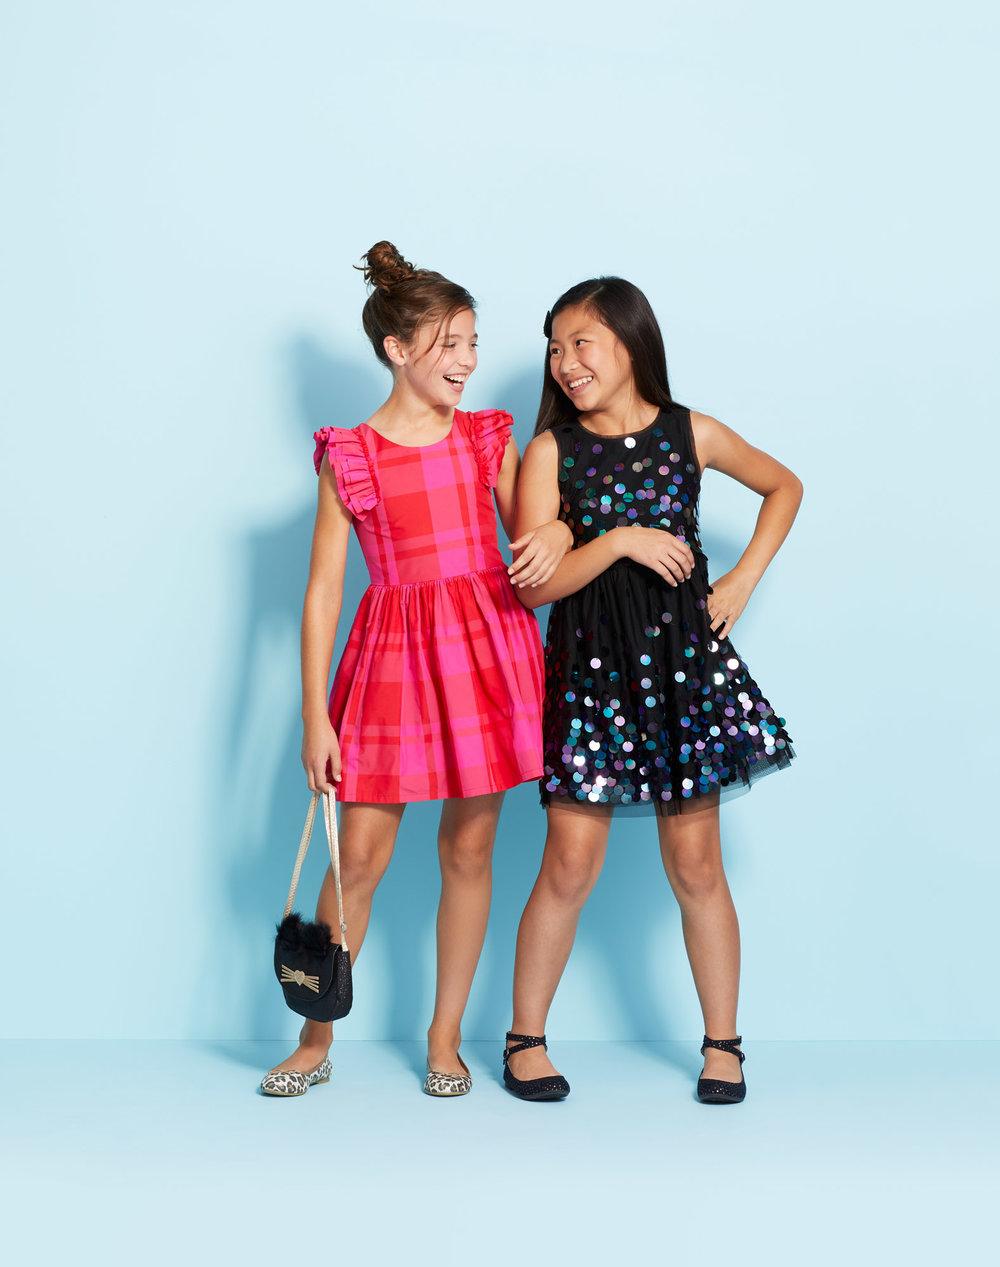 kids_girlsdresses_10wk4_suphero_024 copy.jpg